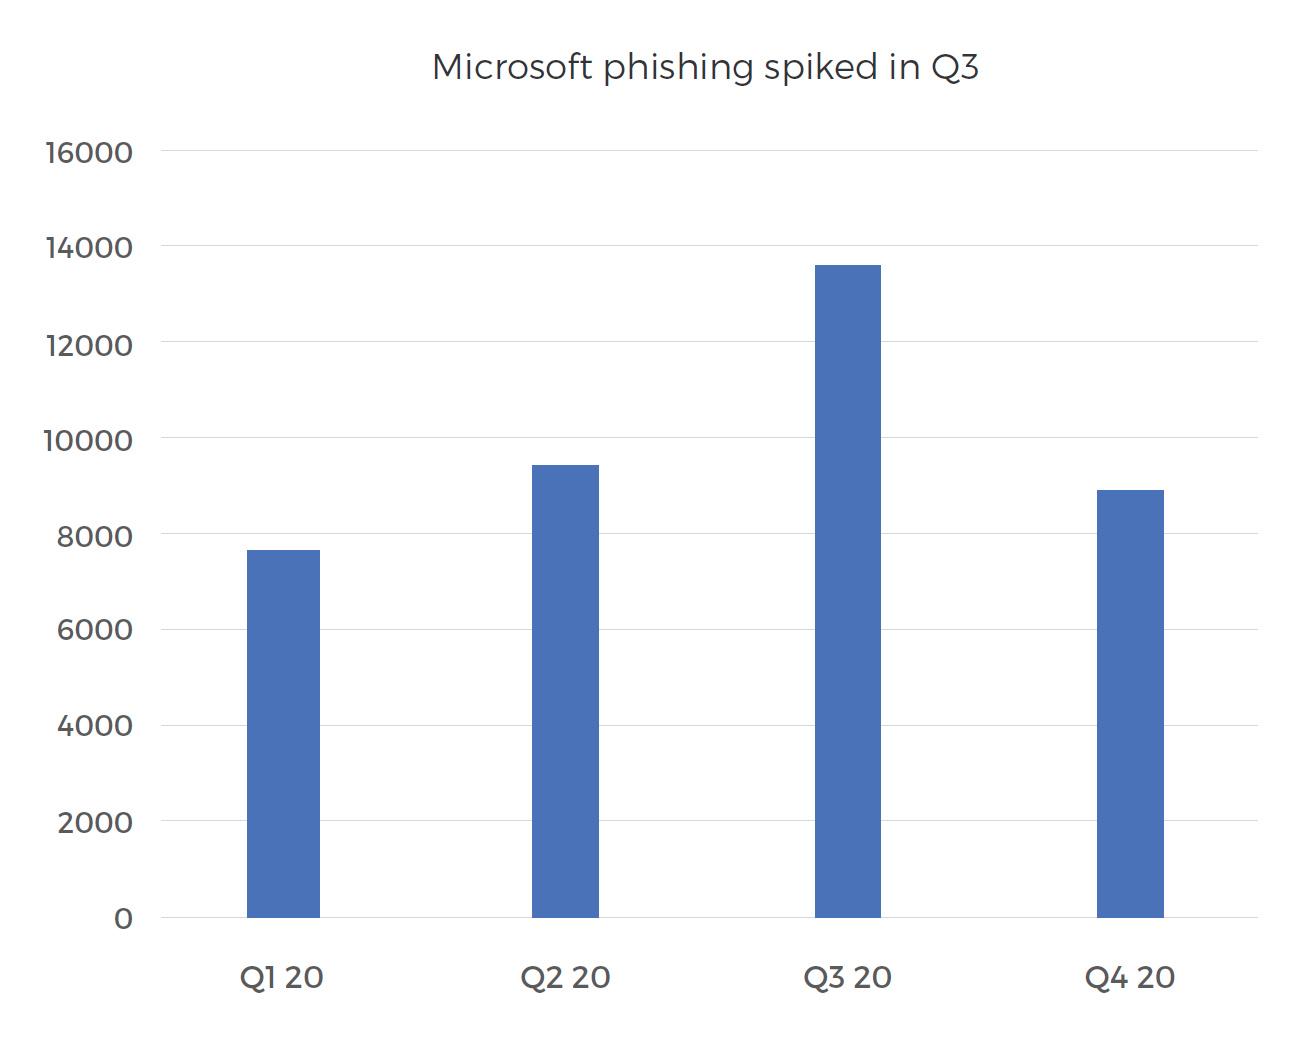 microsoft-phishing-spiked-in-q3